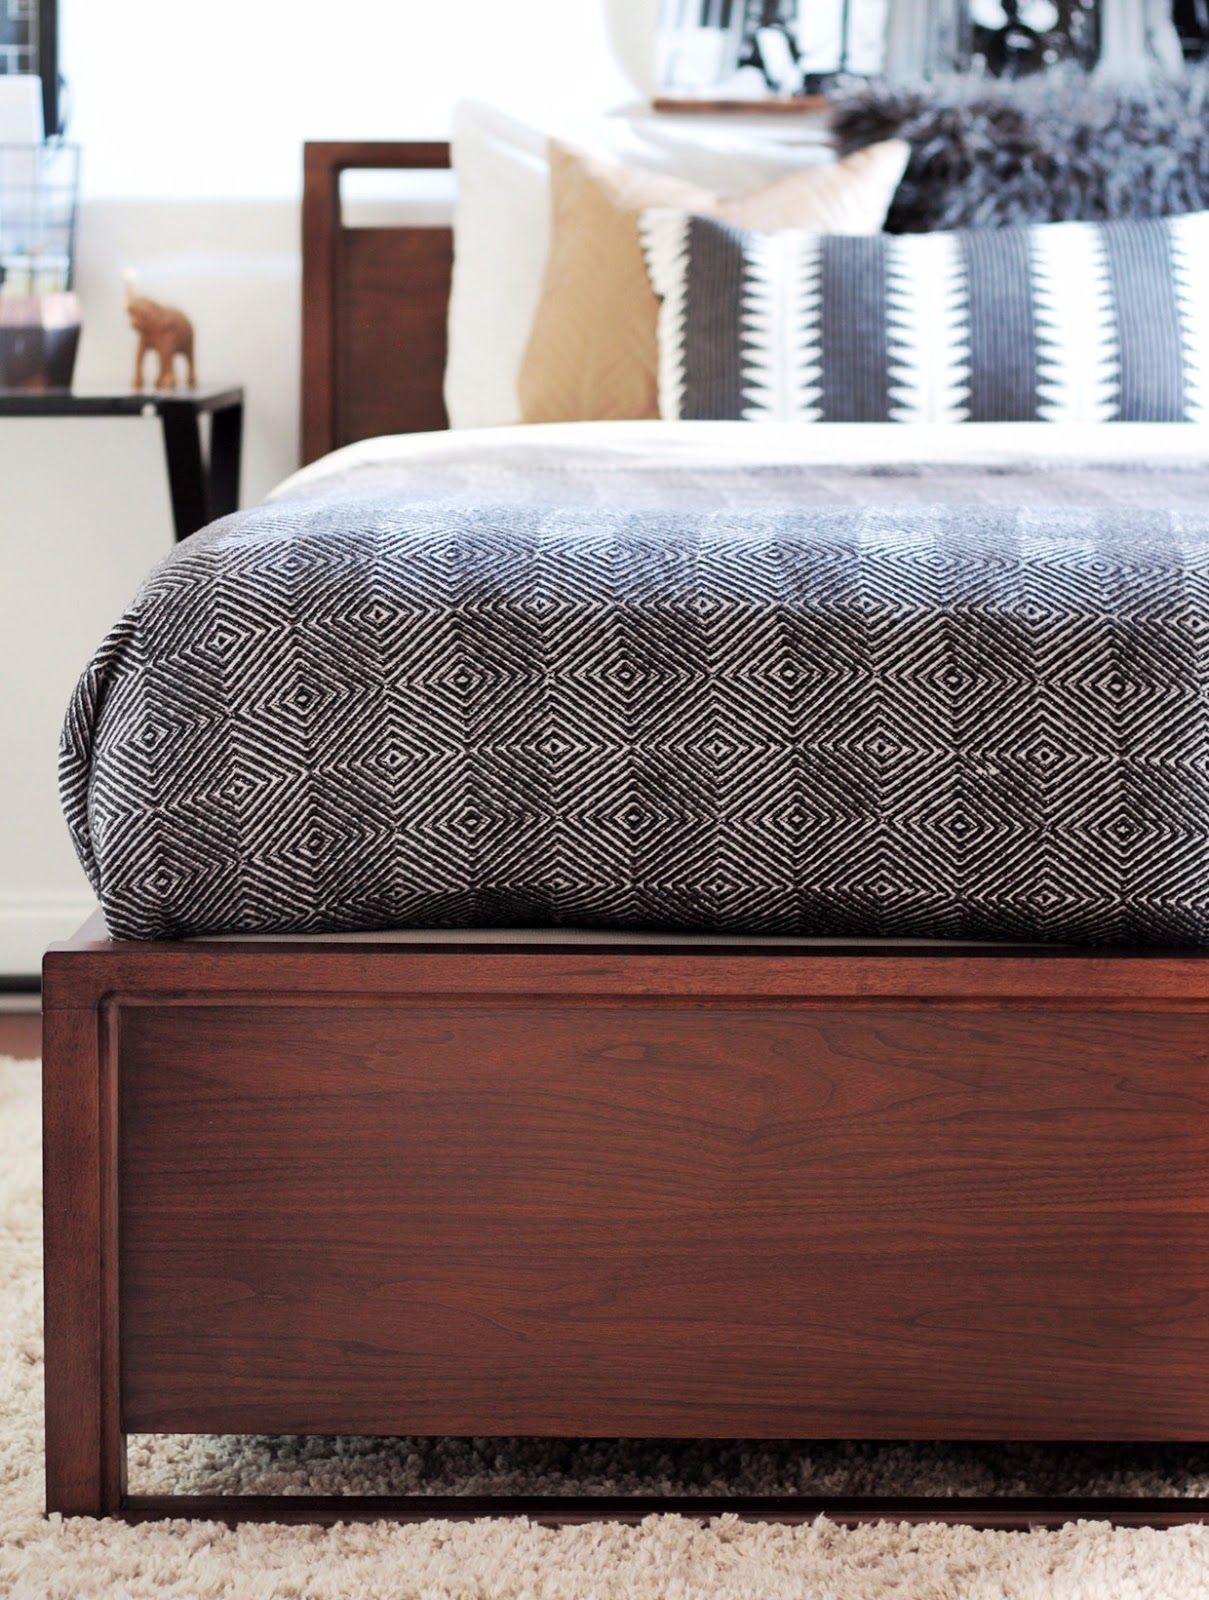 Teen Boy's Basement Bedroom Reveal   House   Basement ... on Teenager Basement Bedroom  id=83458